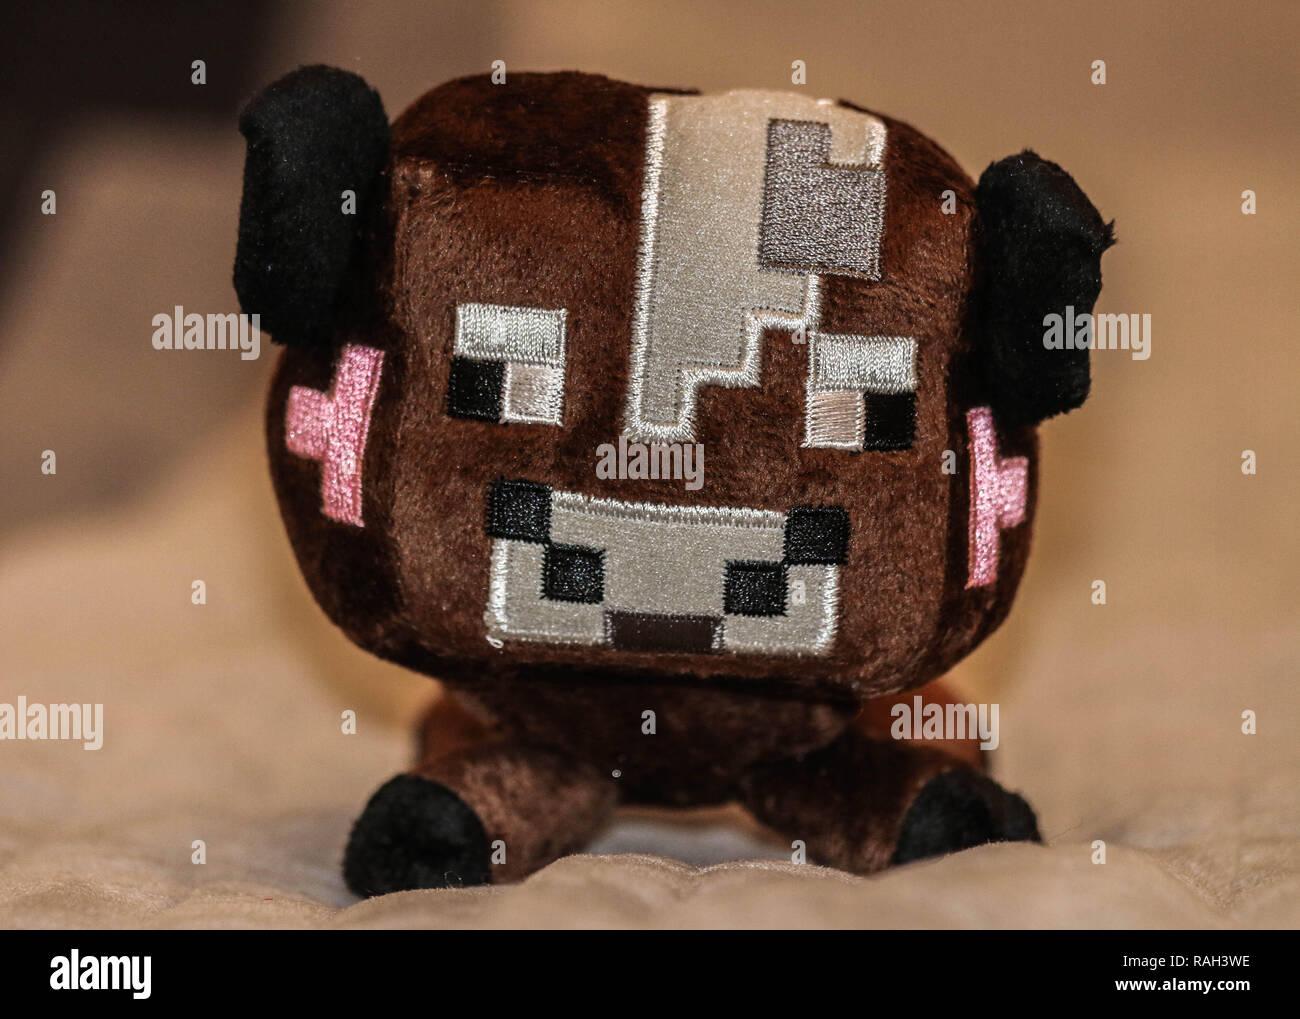 Minecraft brown cow plush - Stock Image